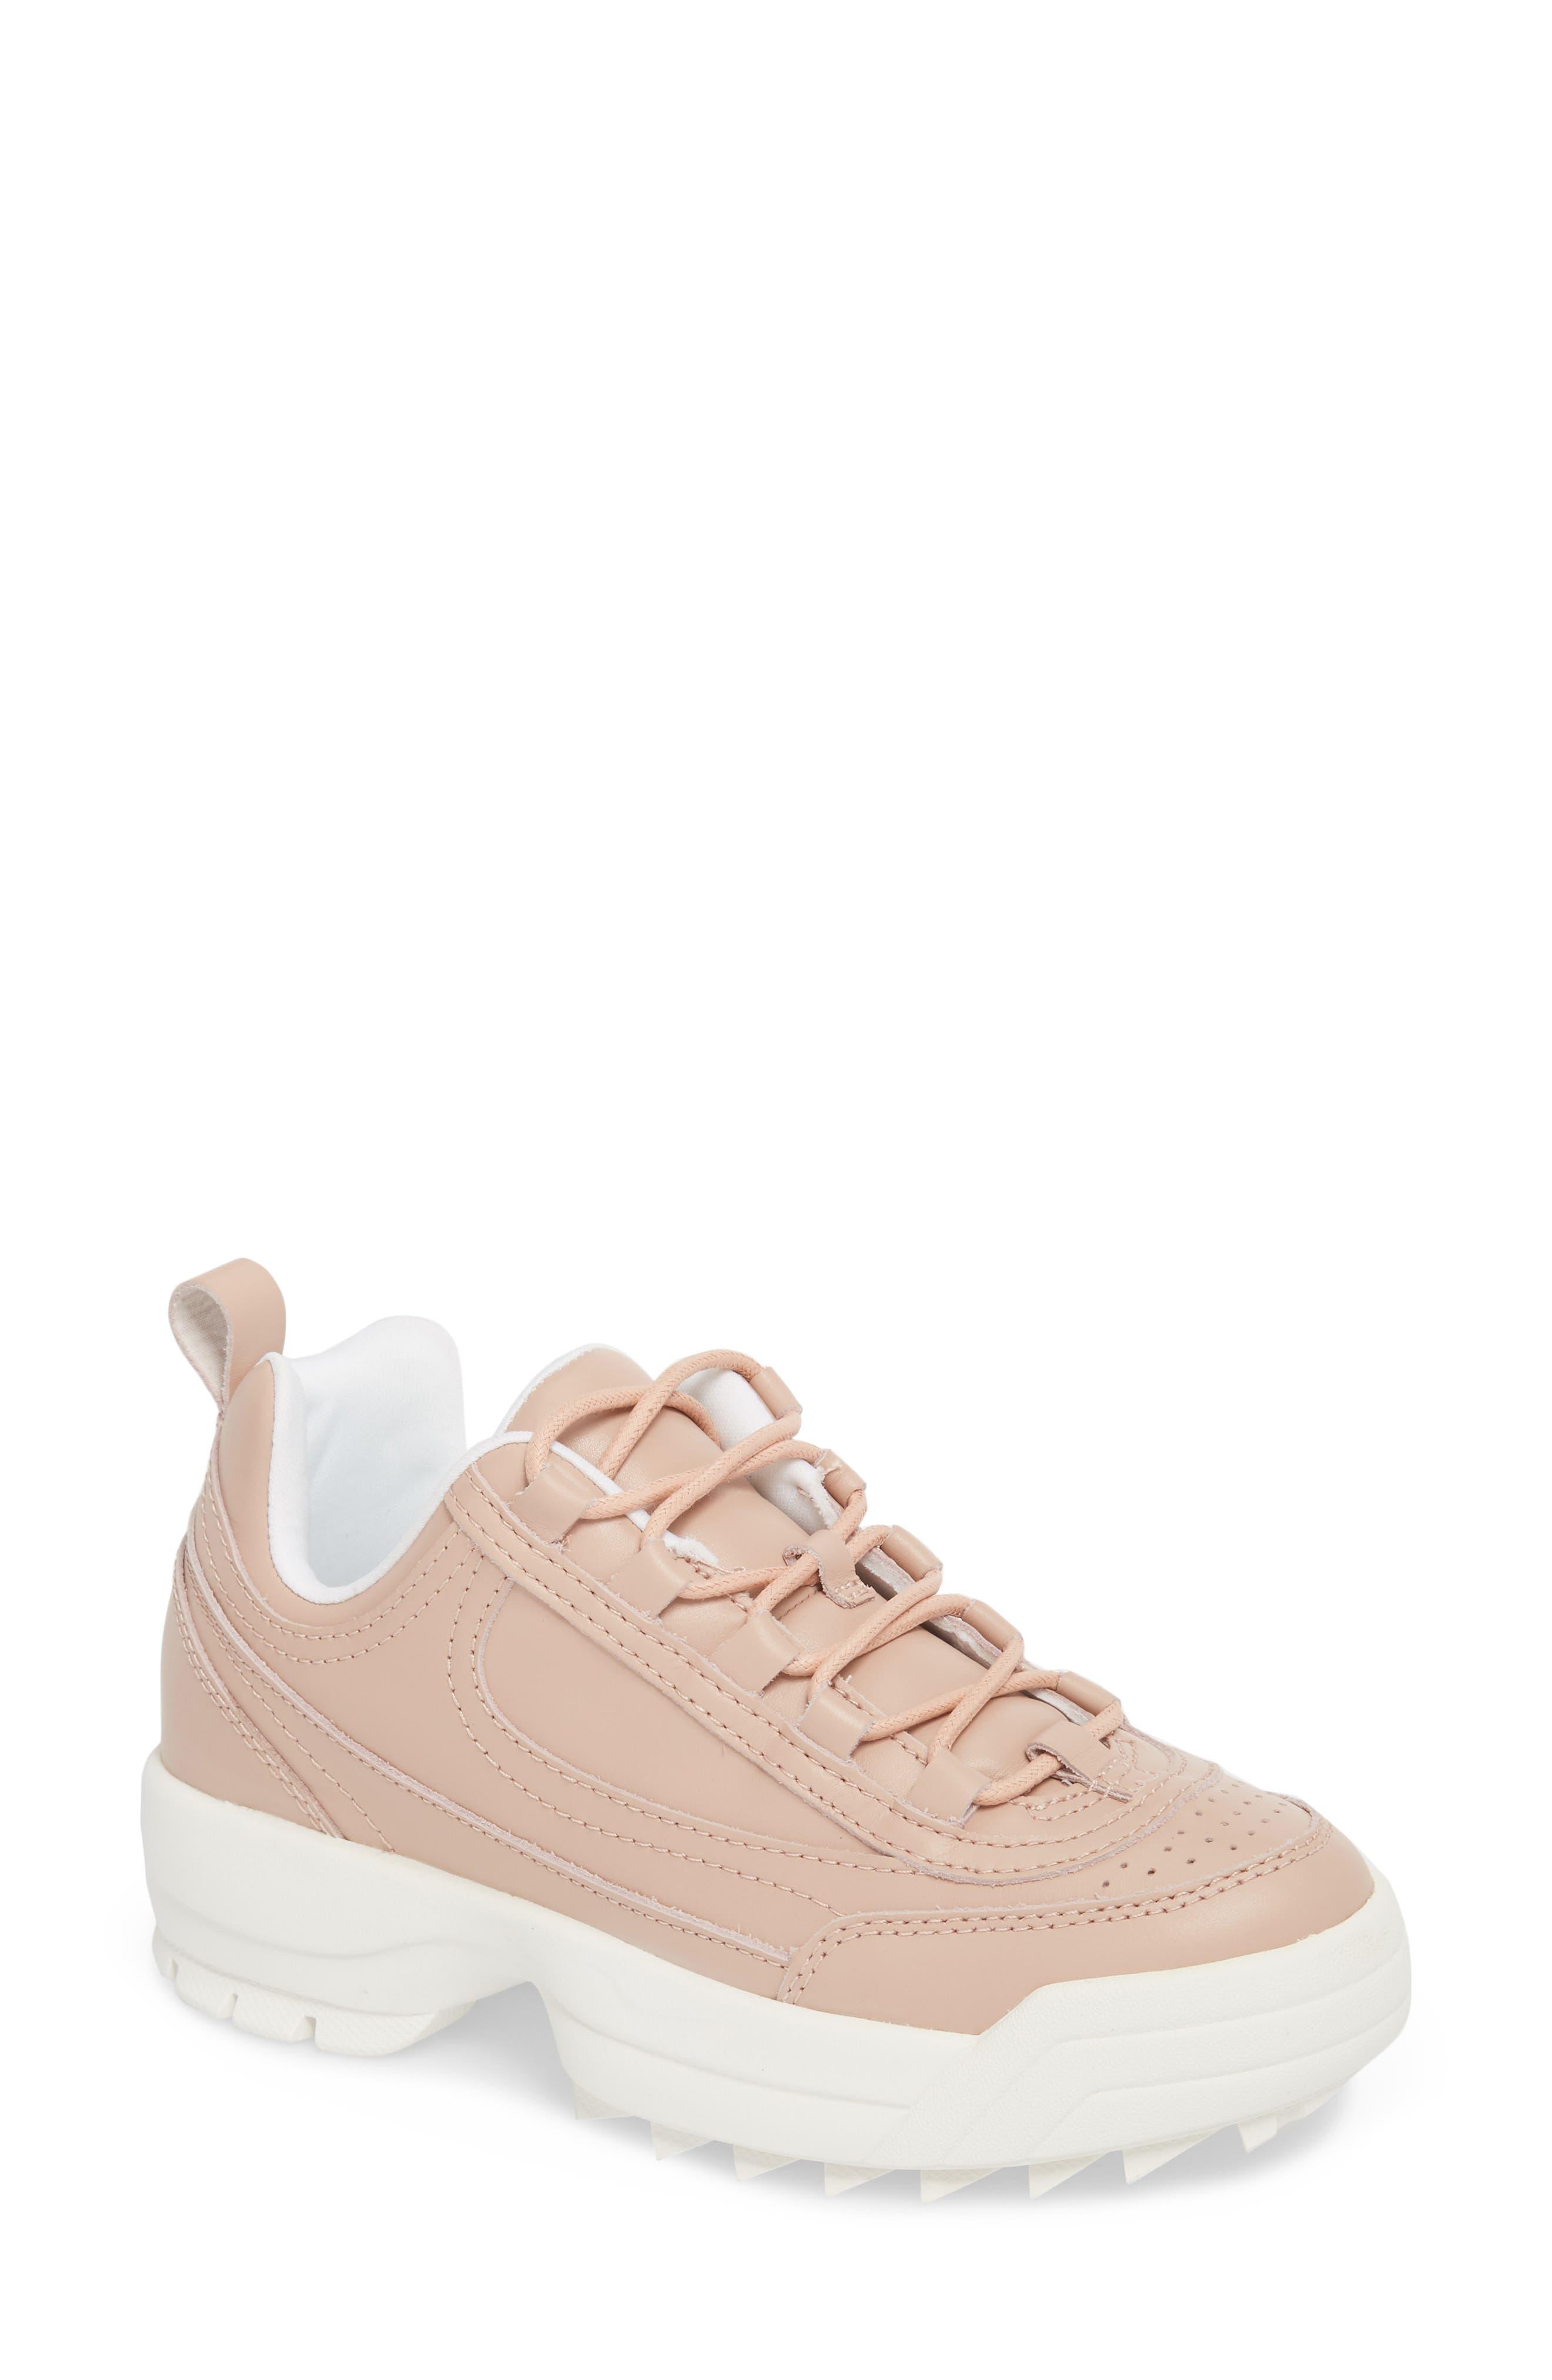 Sidekick Platform Sneaker,                         Main,                         color, NUDE LEATHER